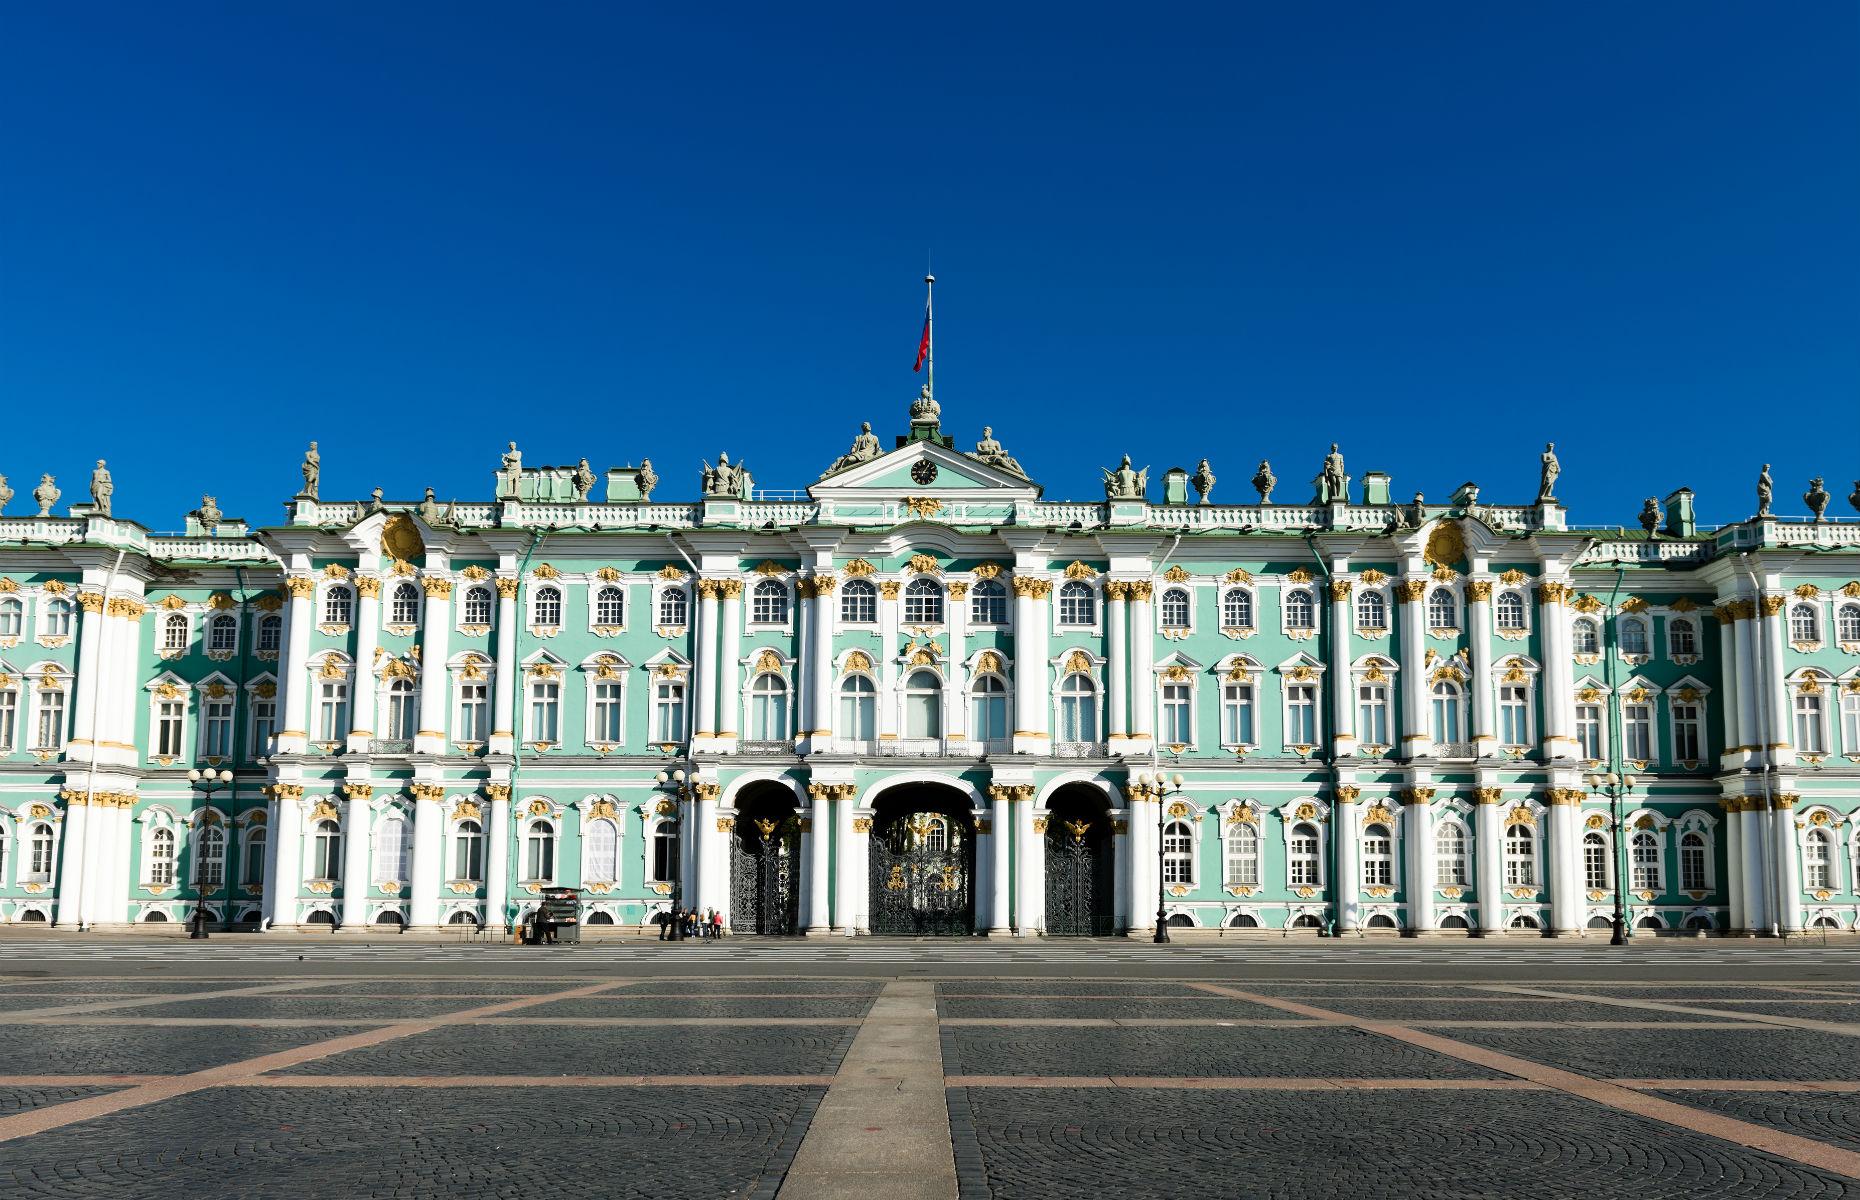 Hermitage Museum exterior (Image: Valeri Potapova/Shutterstock)